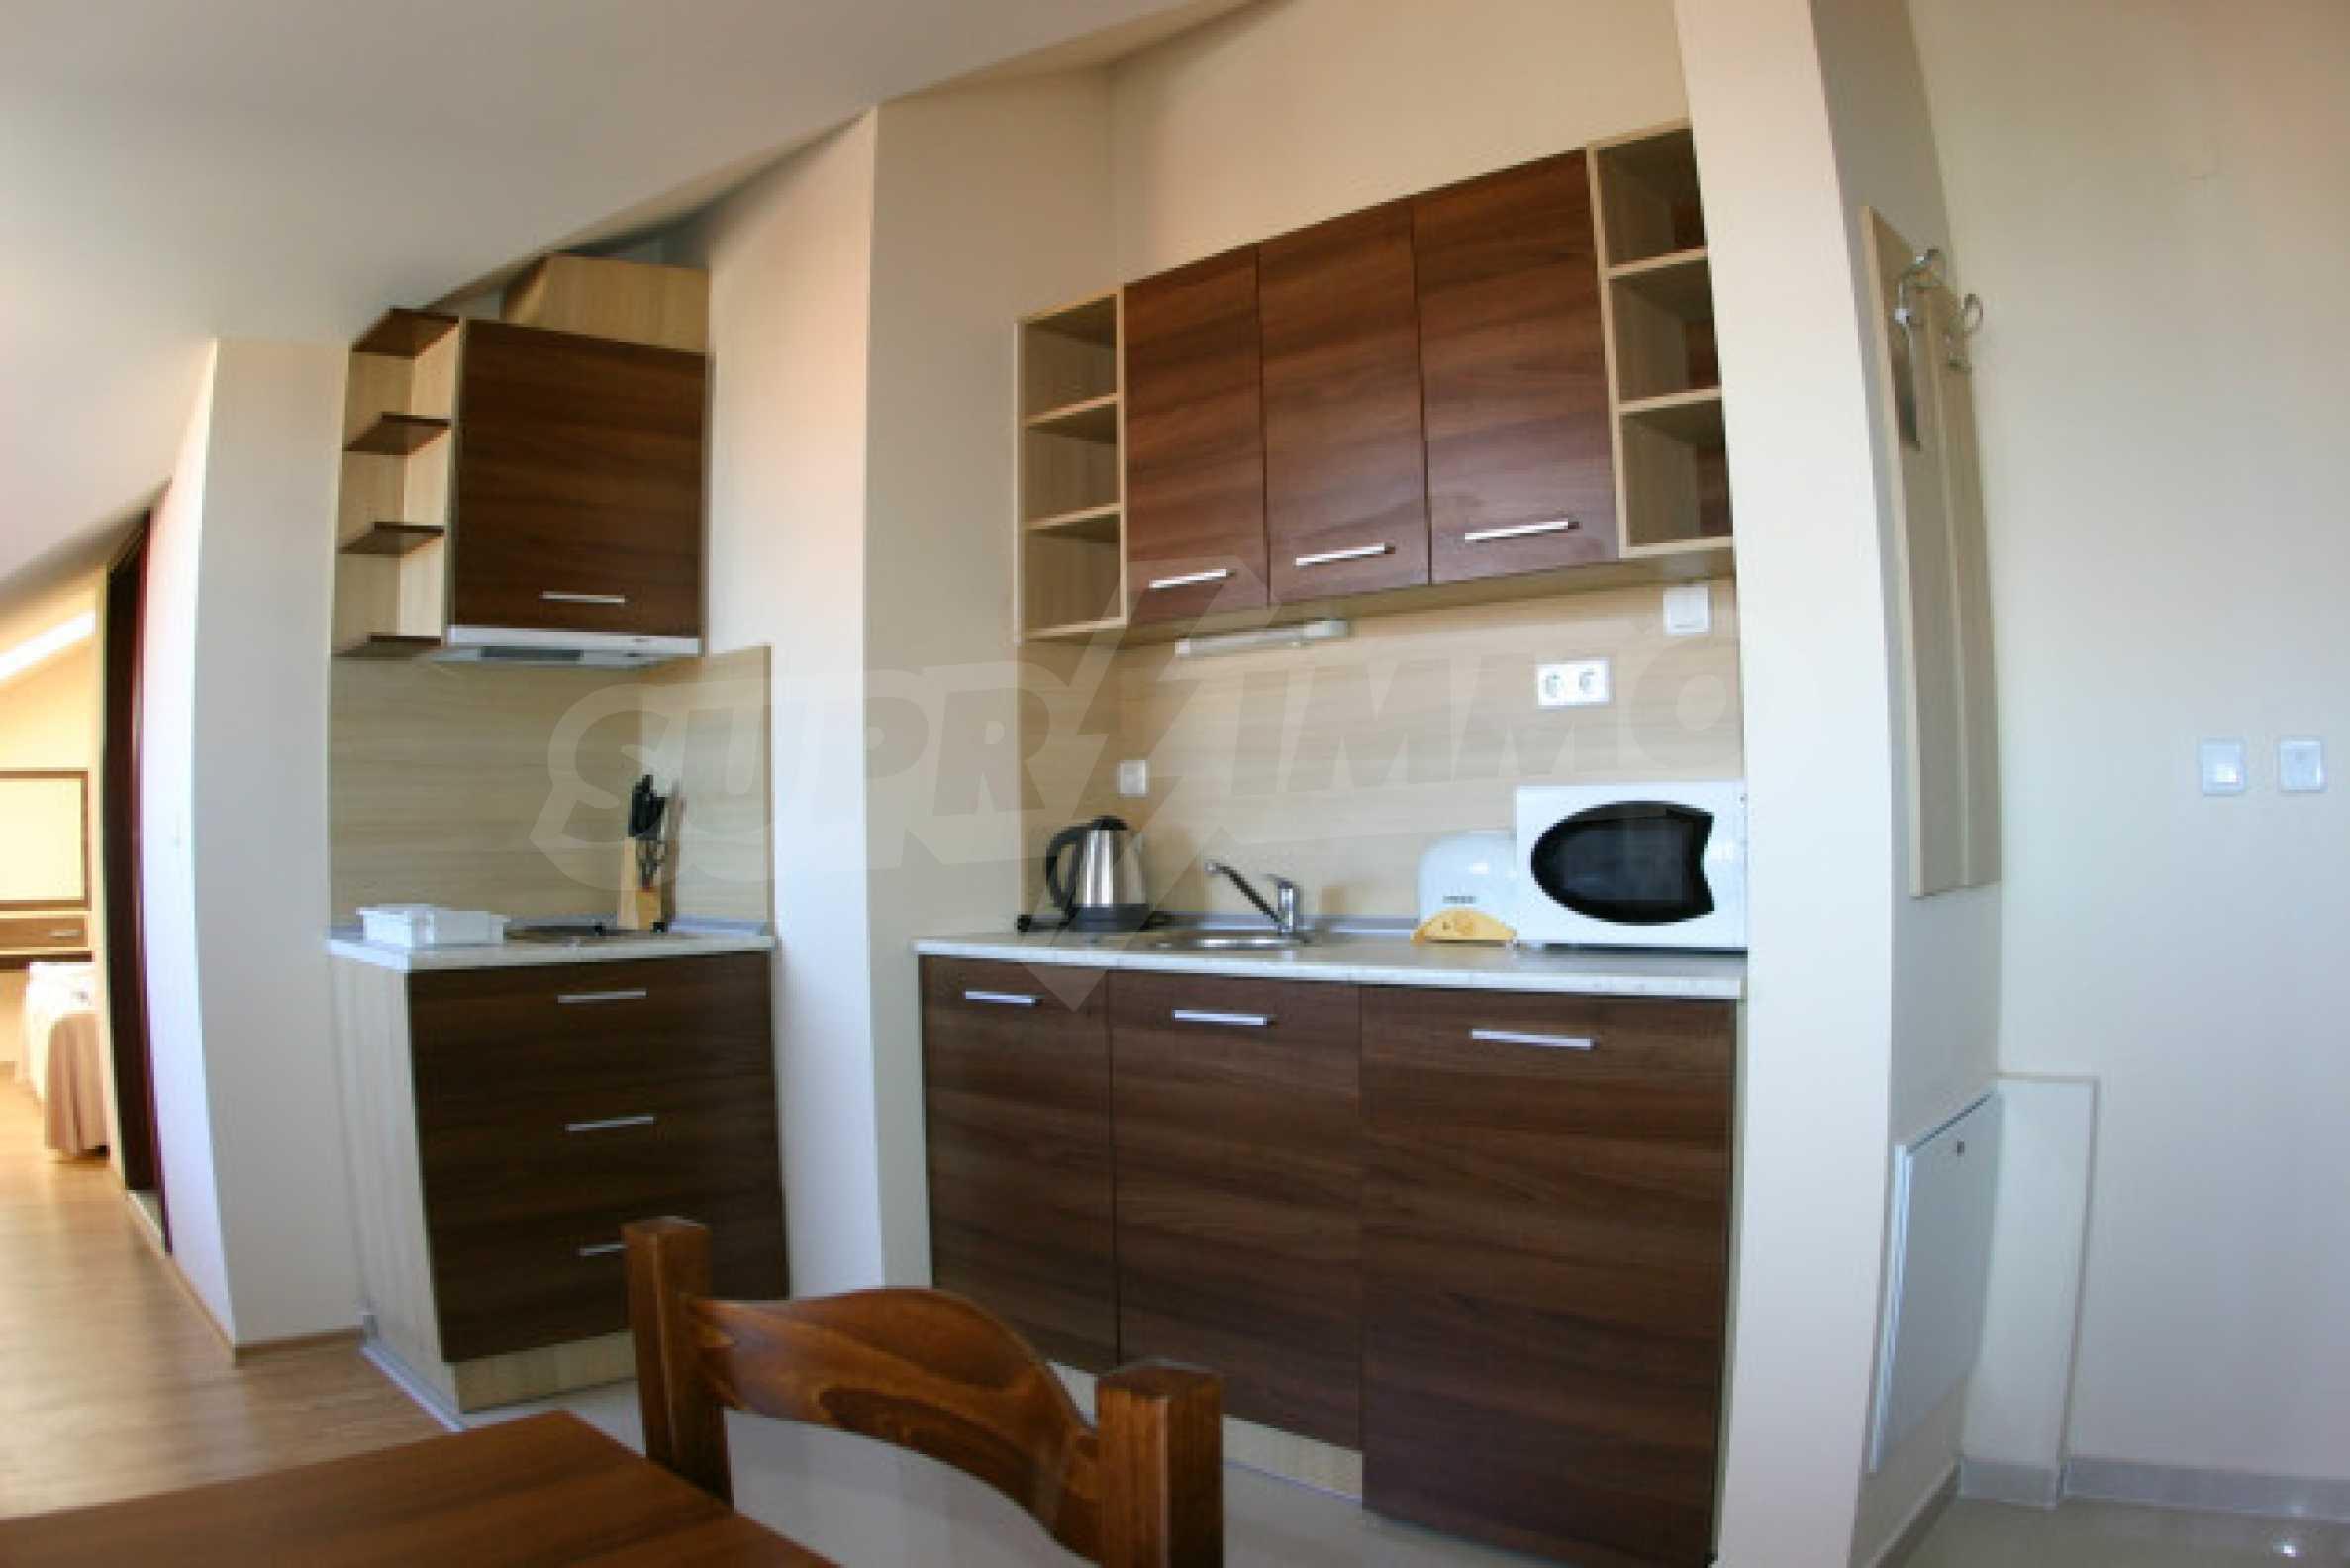 1 Bedroom Penthouse In Belmont Complex